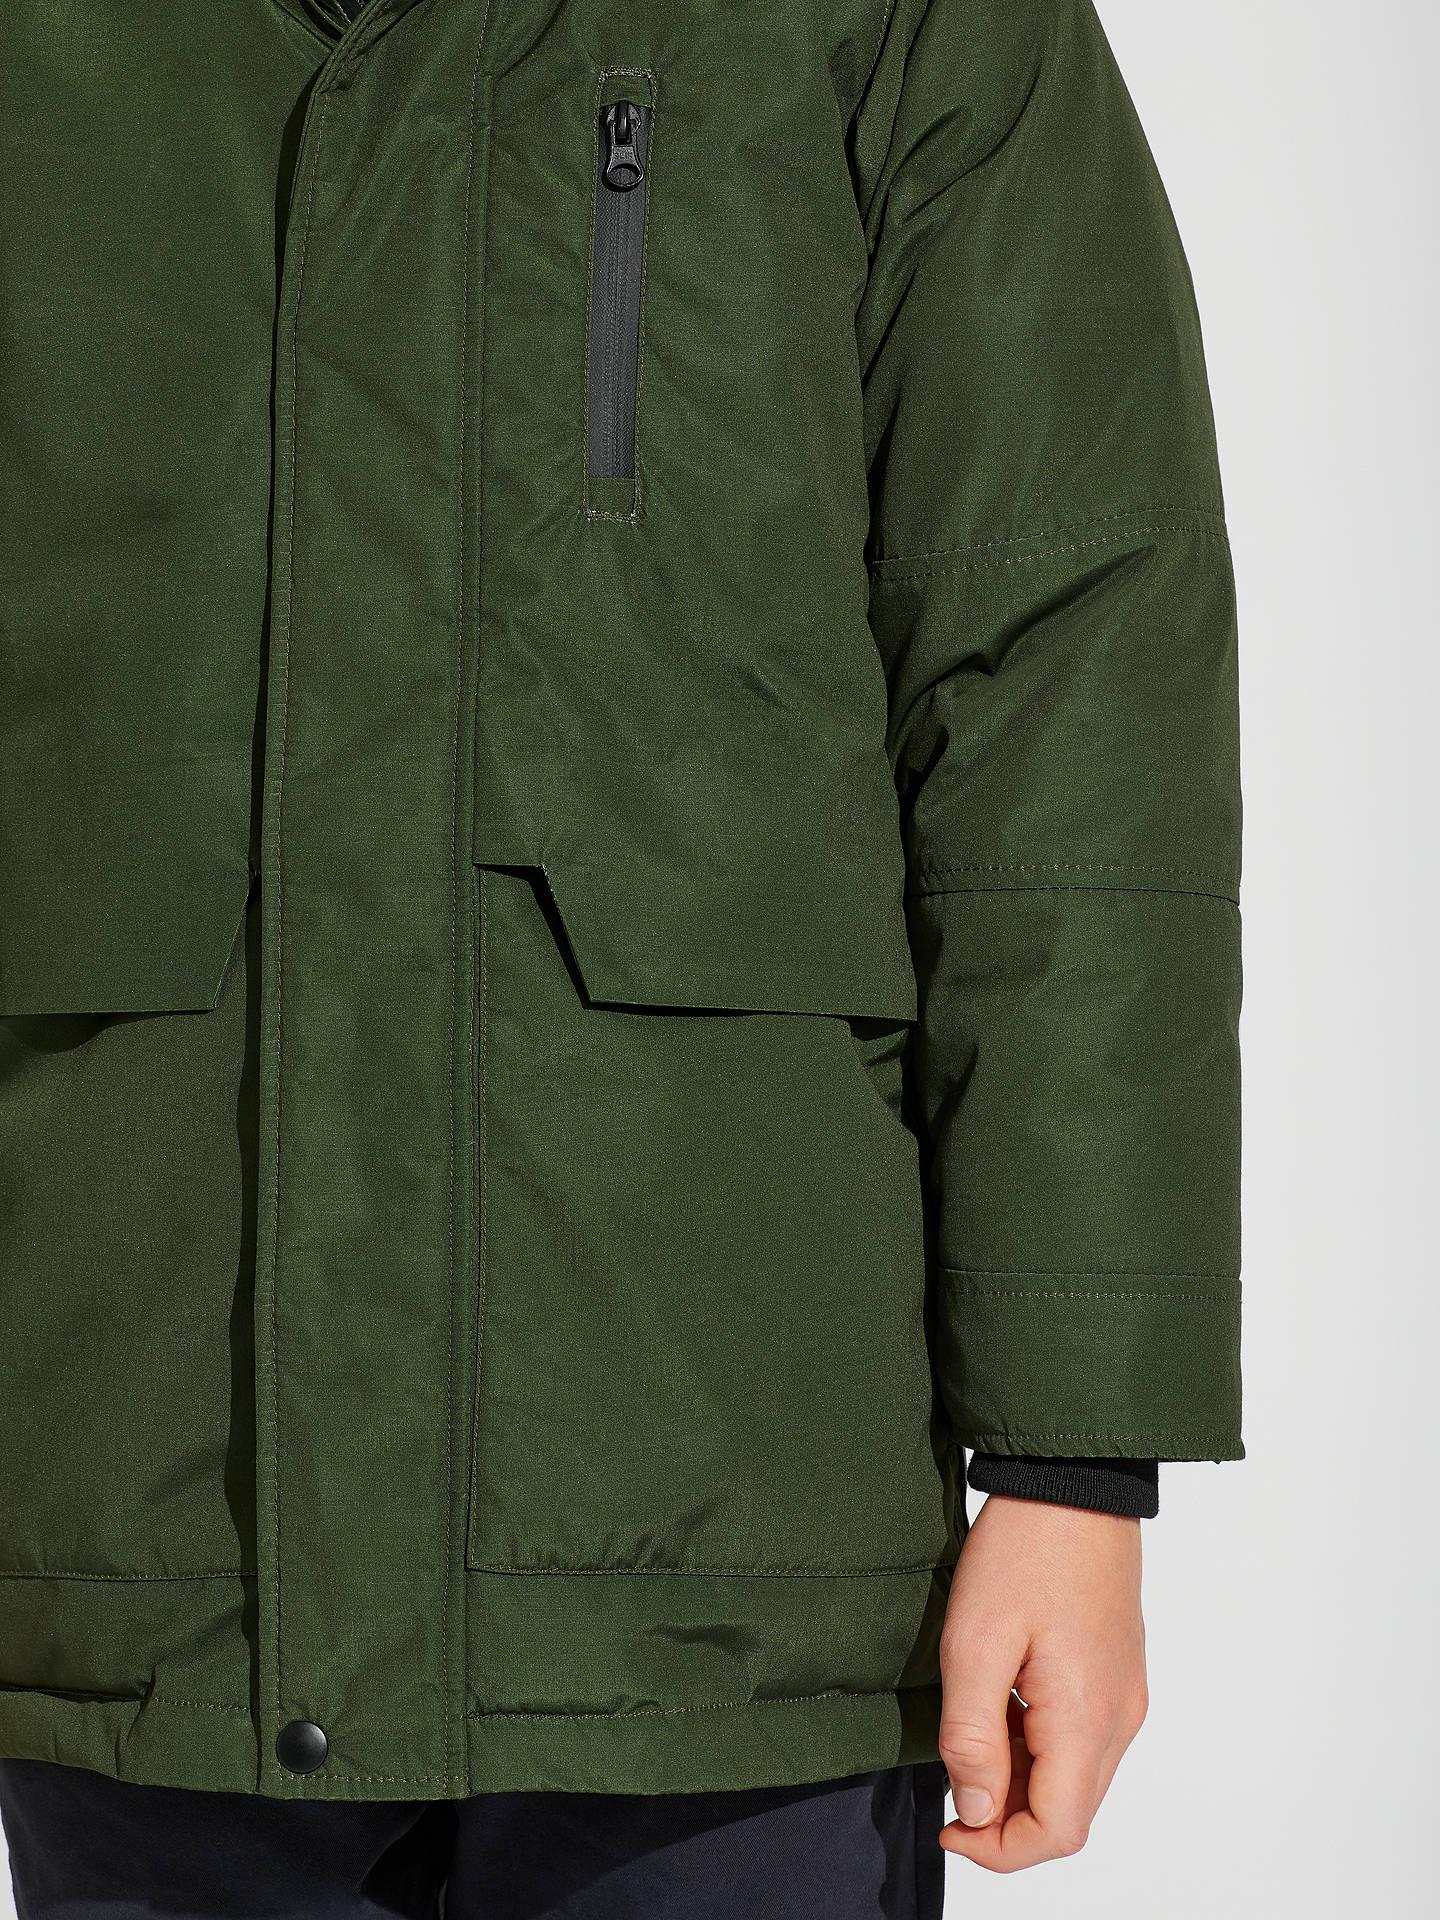 22d866e5f438 John Lewis Boys  Fallout Parka Jacket